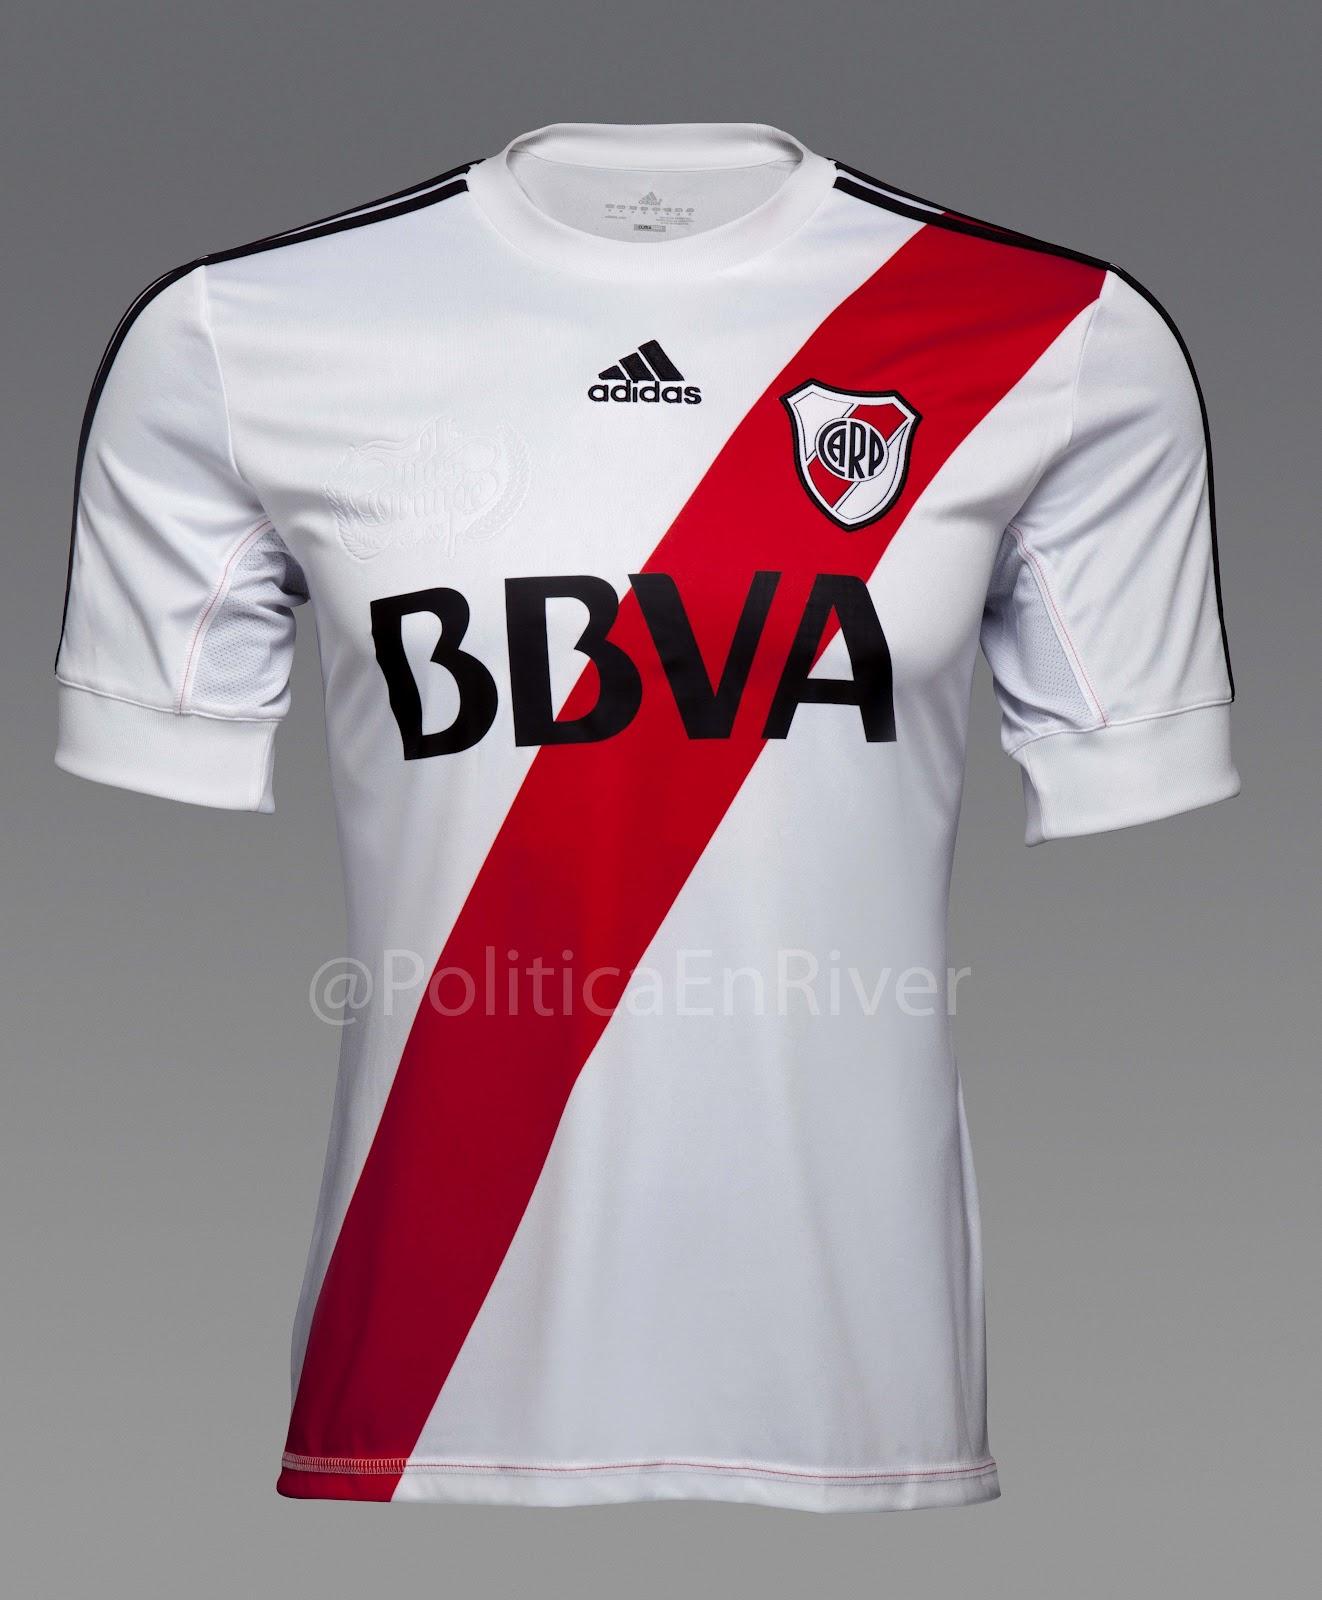 Club Atlético Boca Juniors Salvapantallas, Fondos de